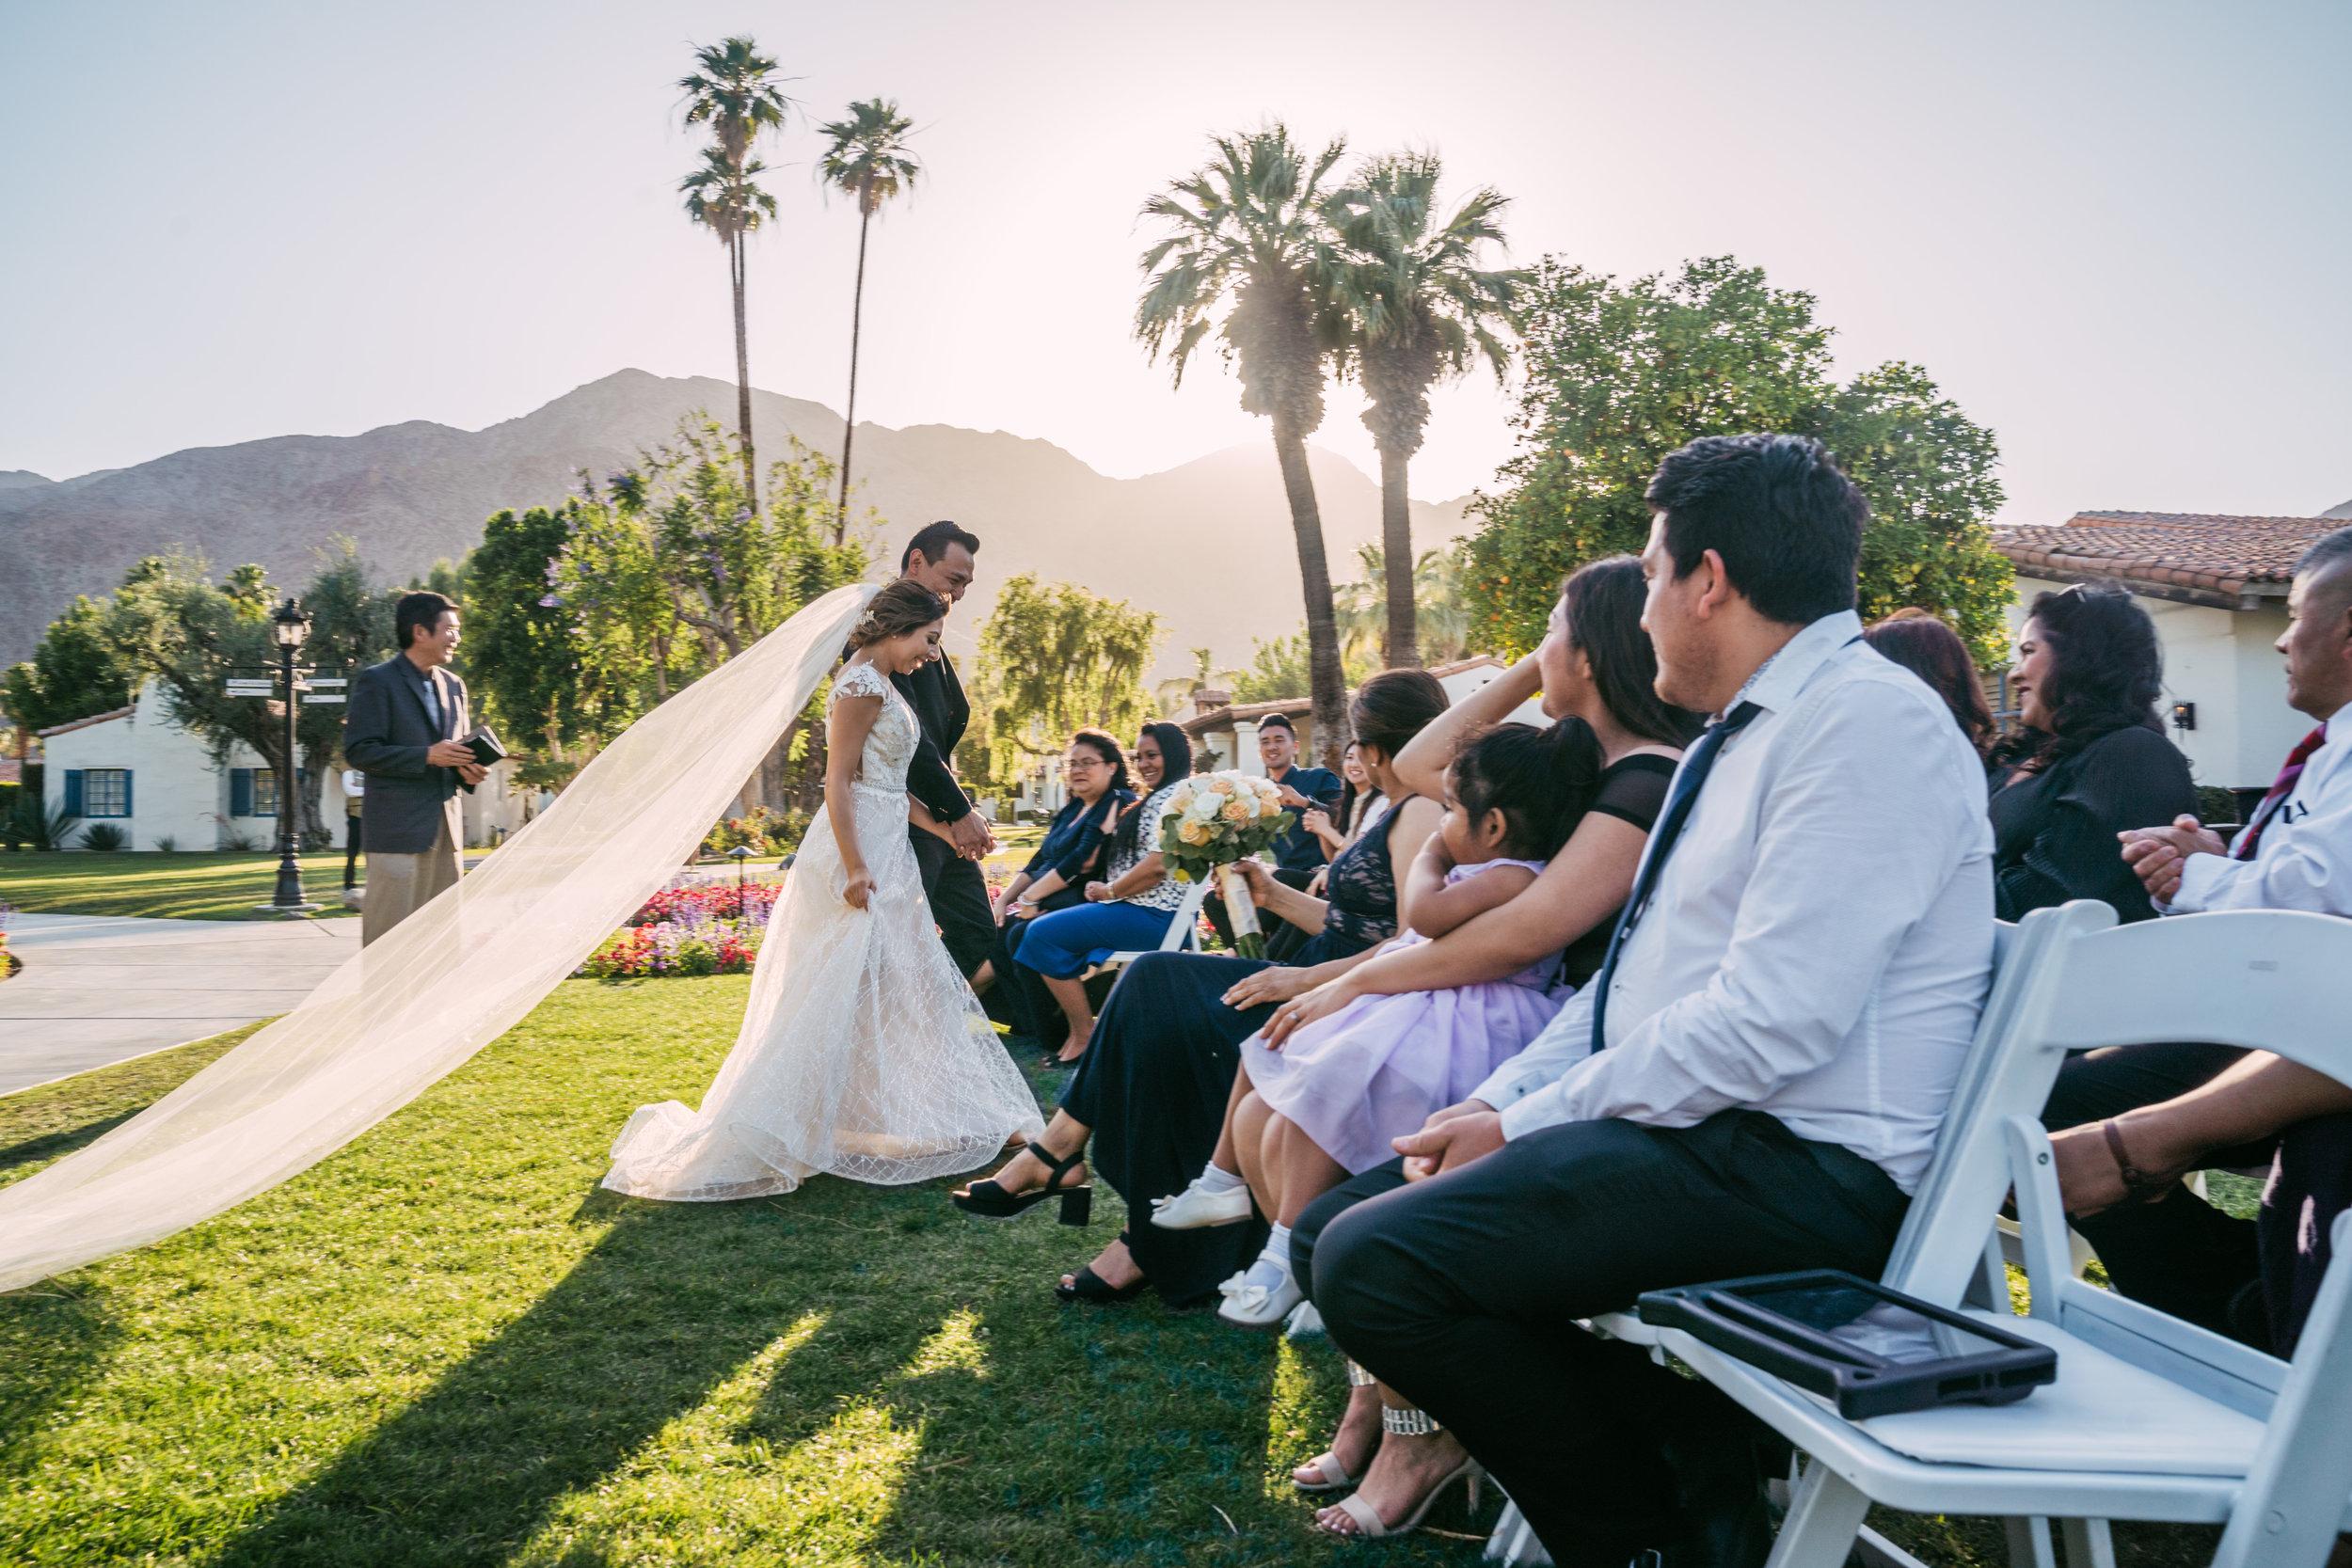 marysol-la-quinta-palm-spring-wedding-ceremony-1-51.jpg